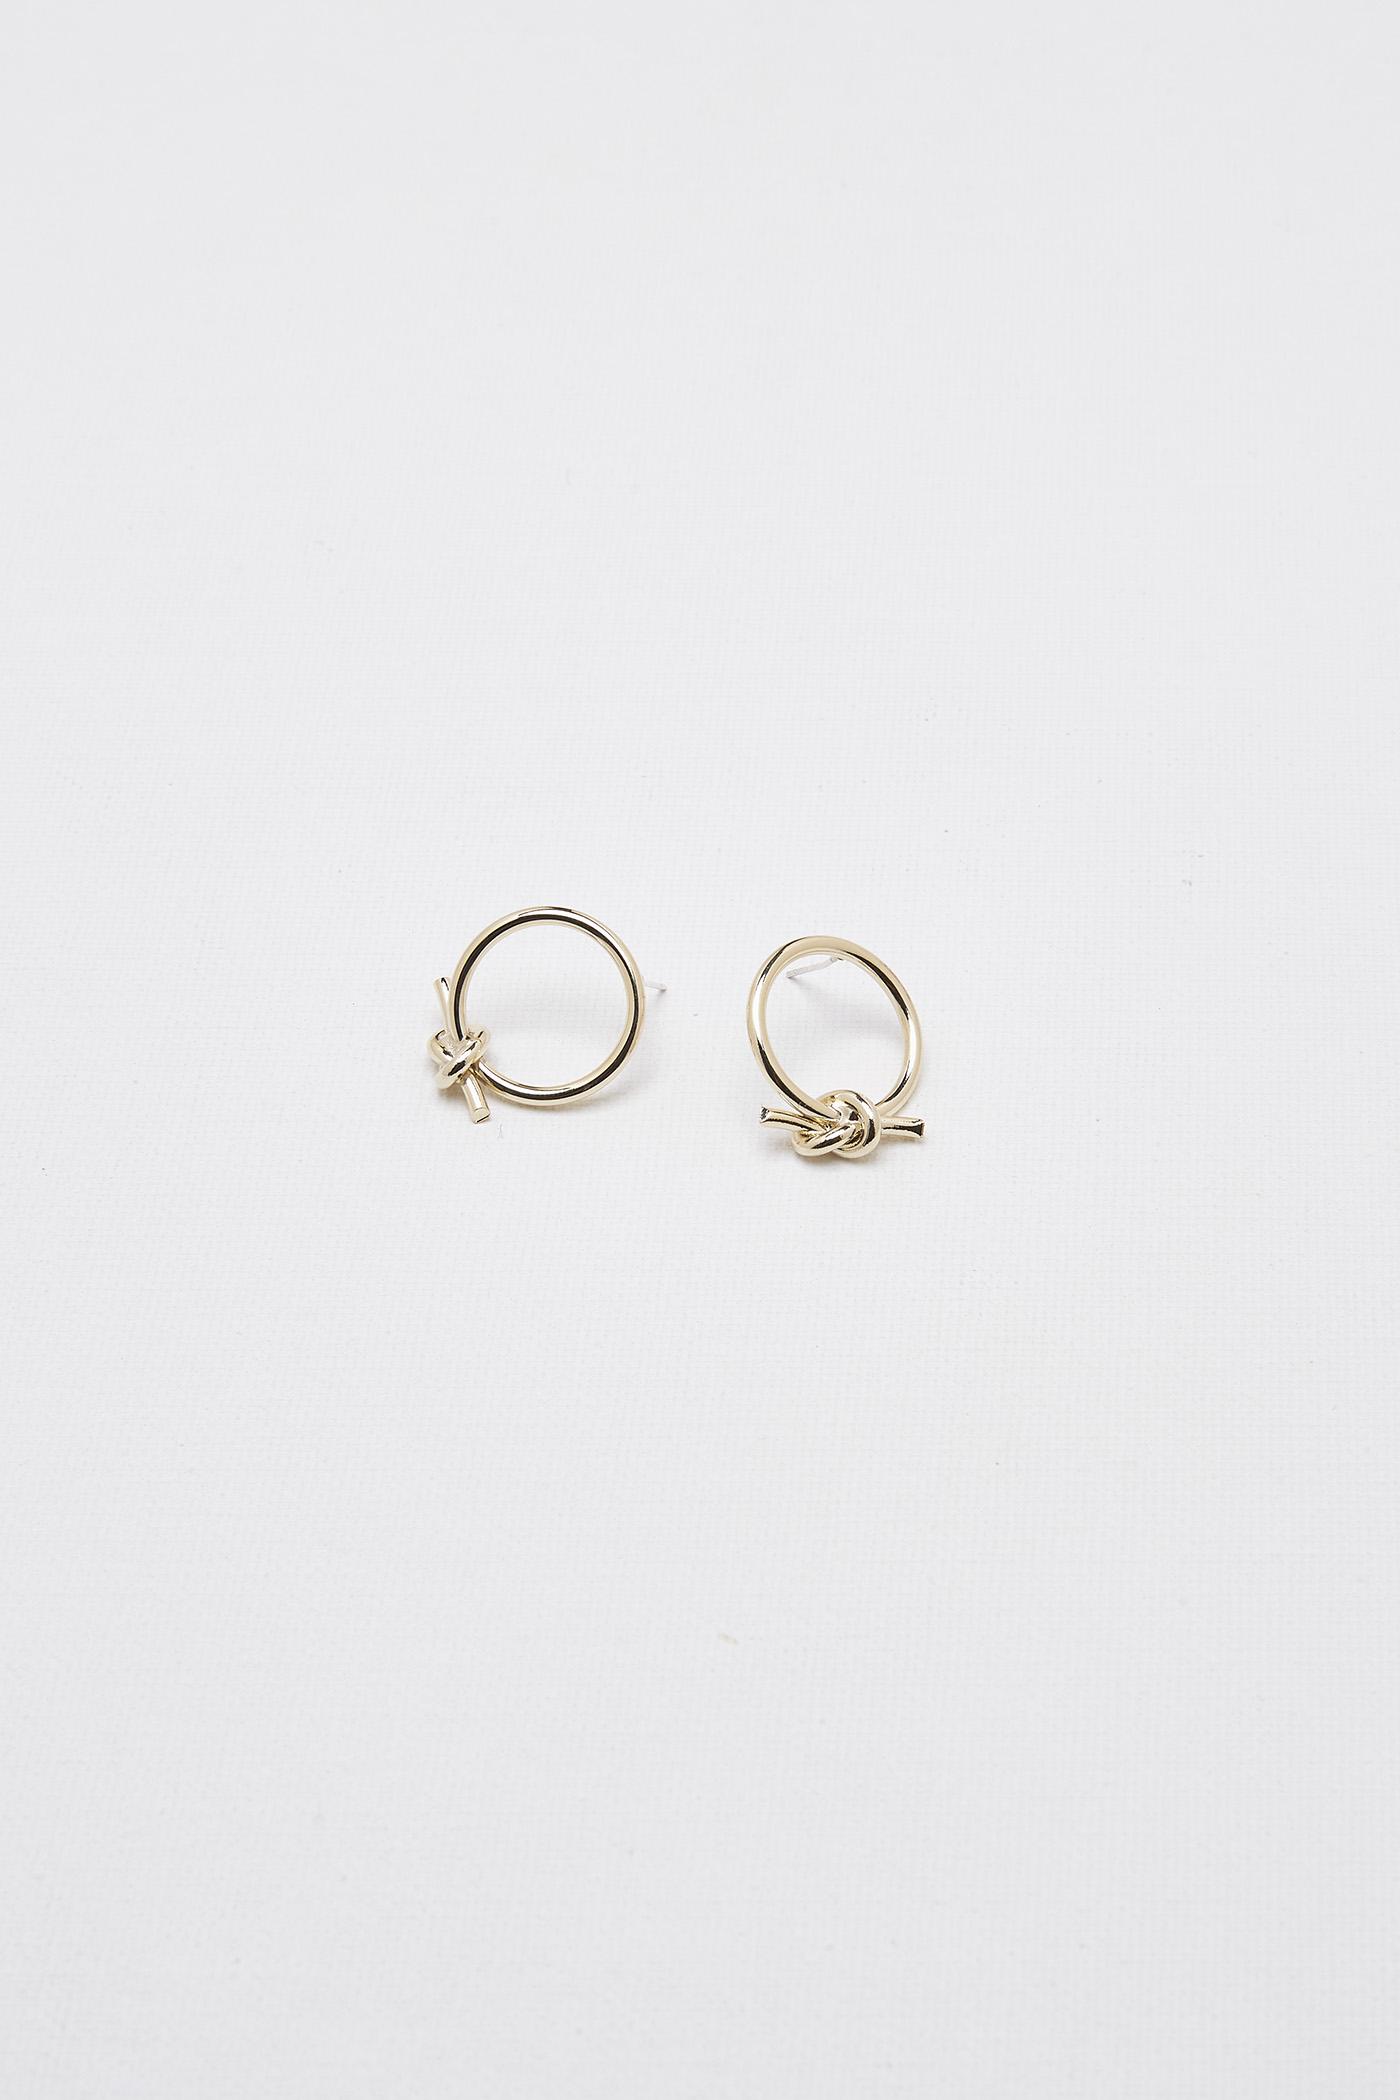 Caine Earrings